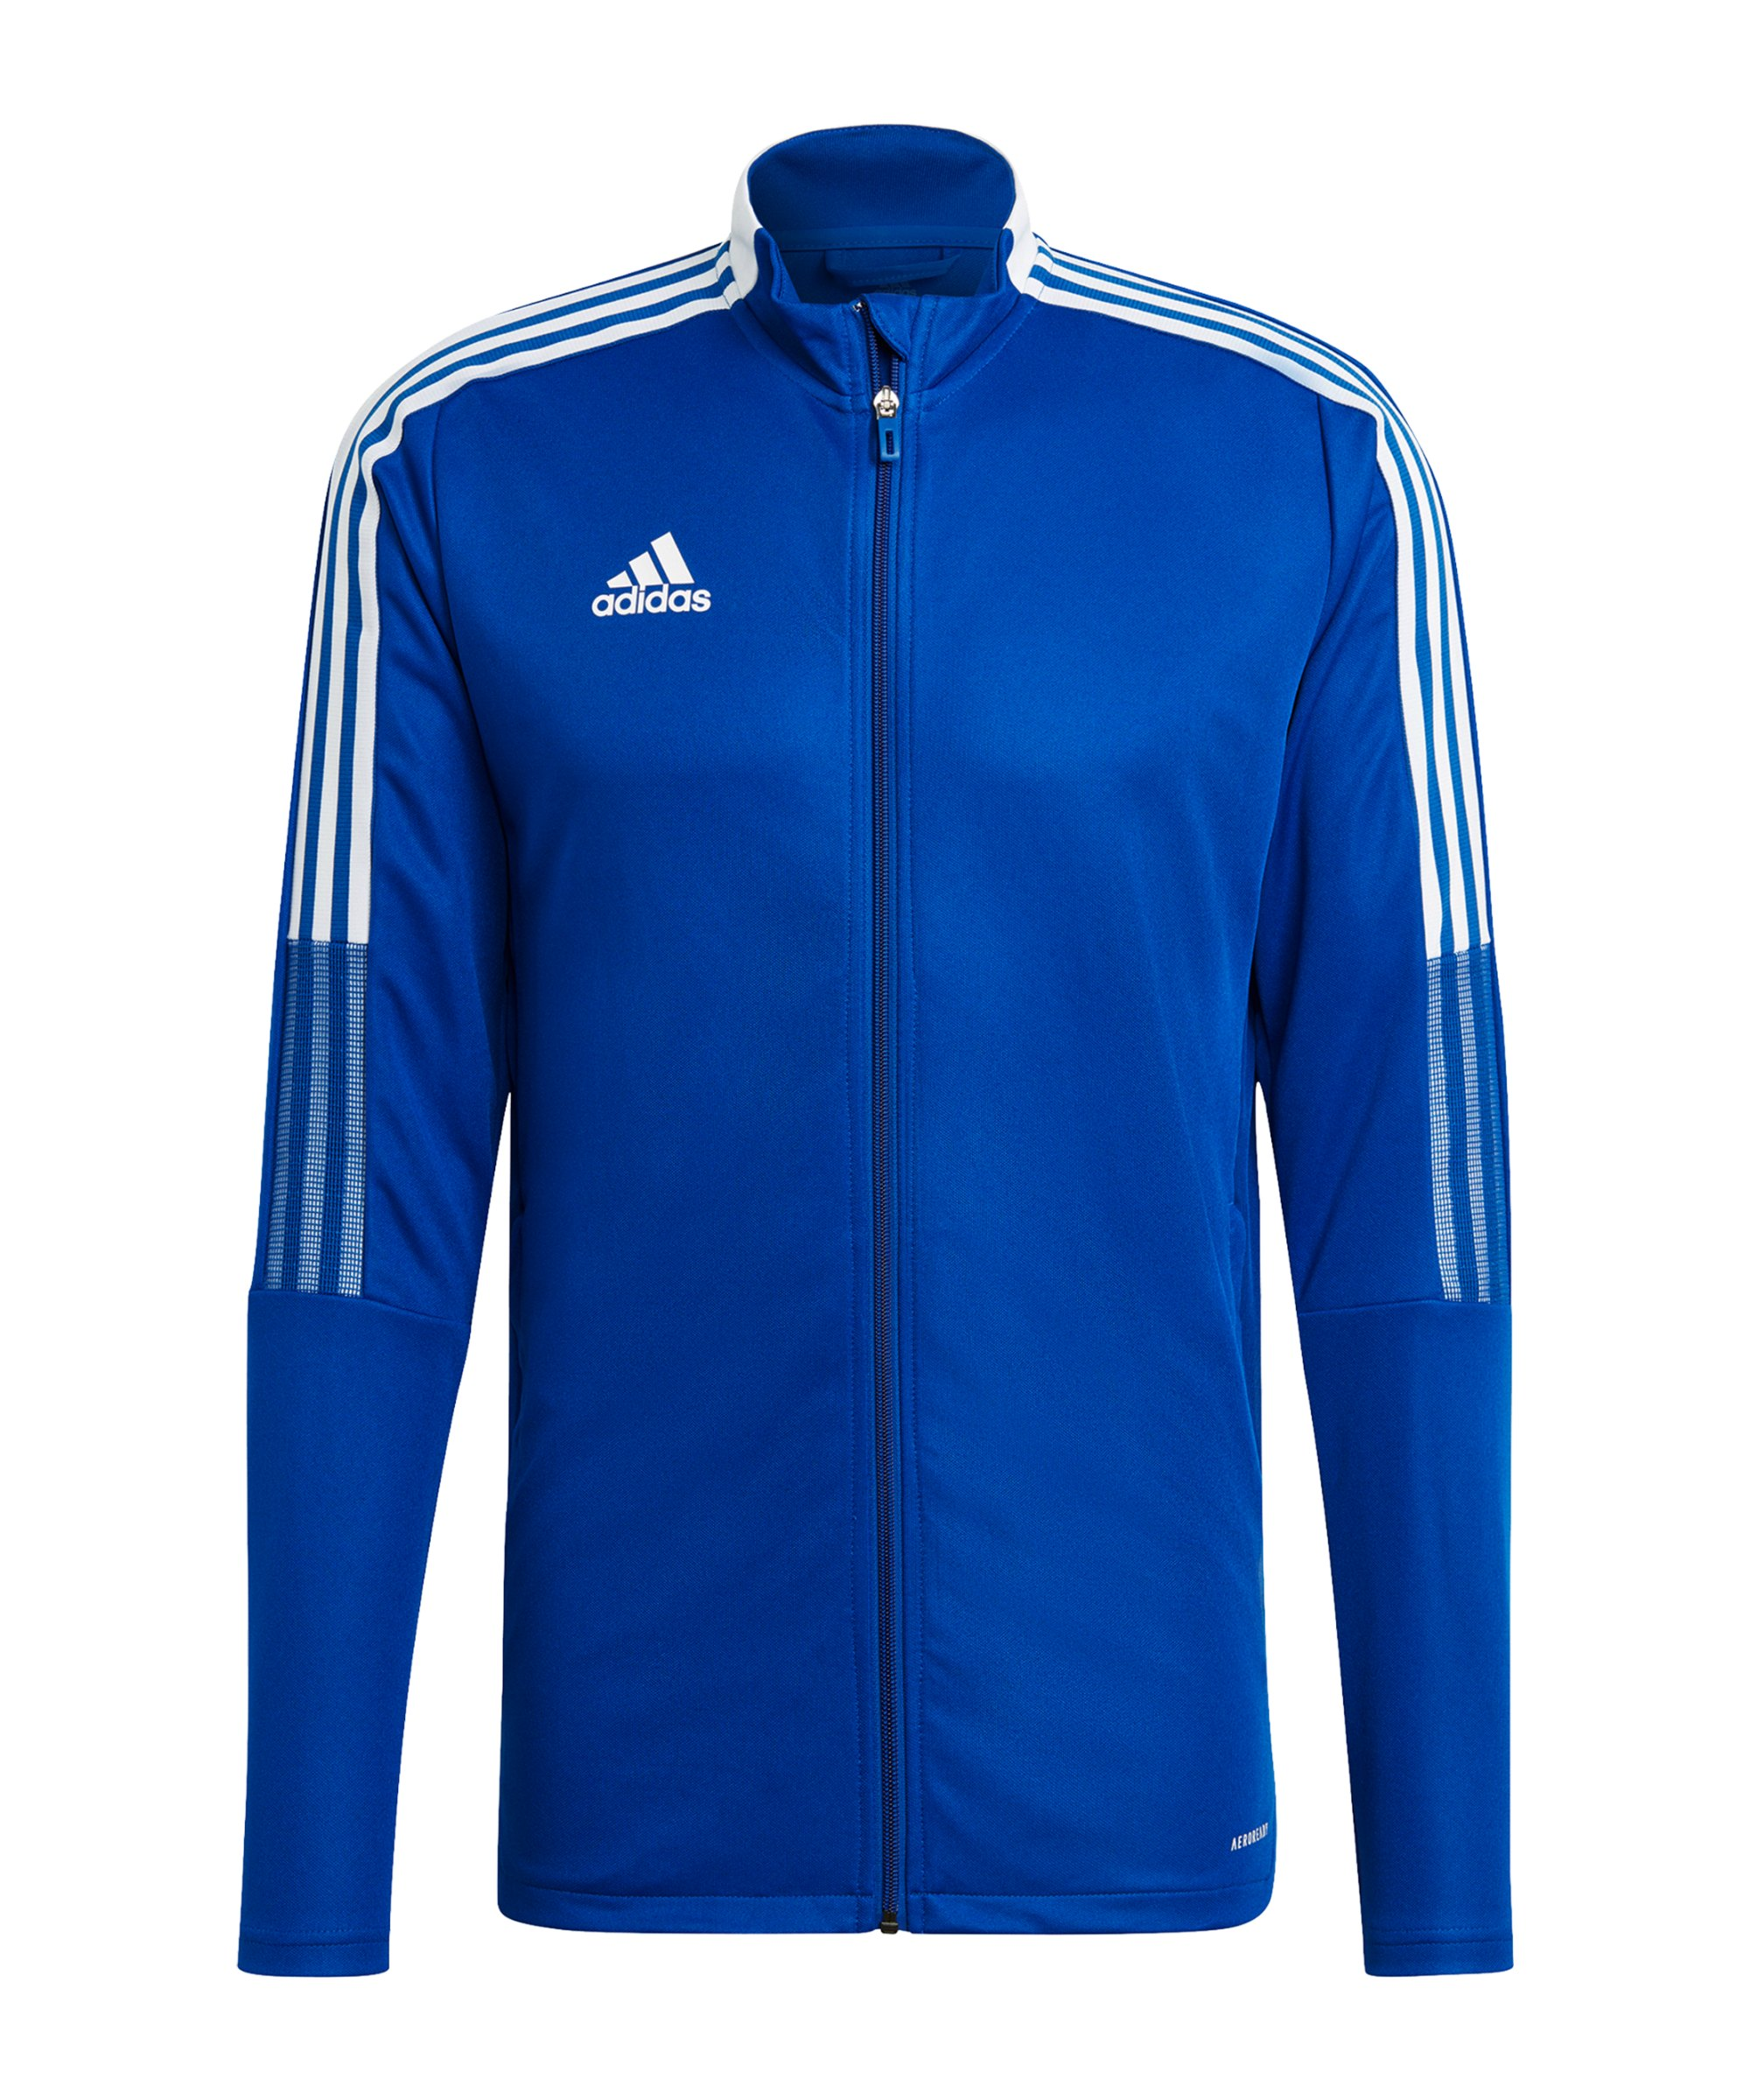 adidas Tiro 21 Trainingsjacke Blau - blau